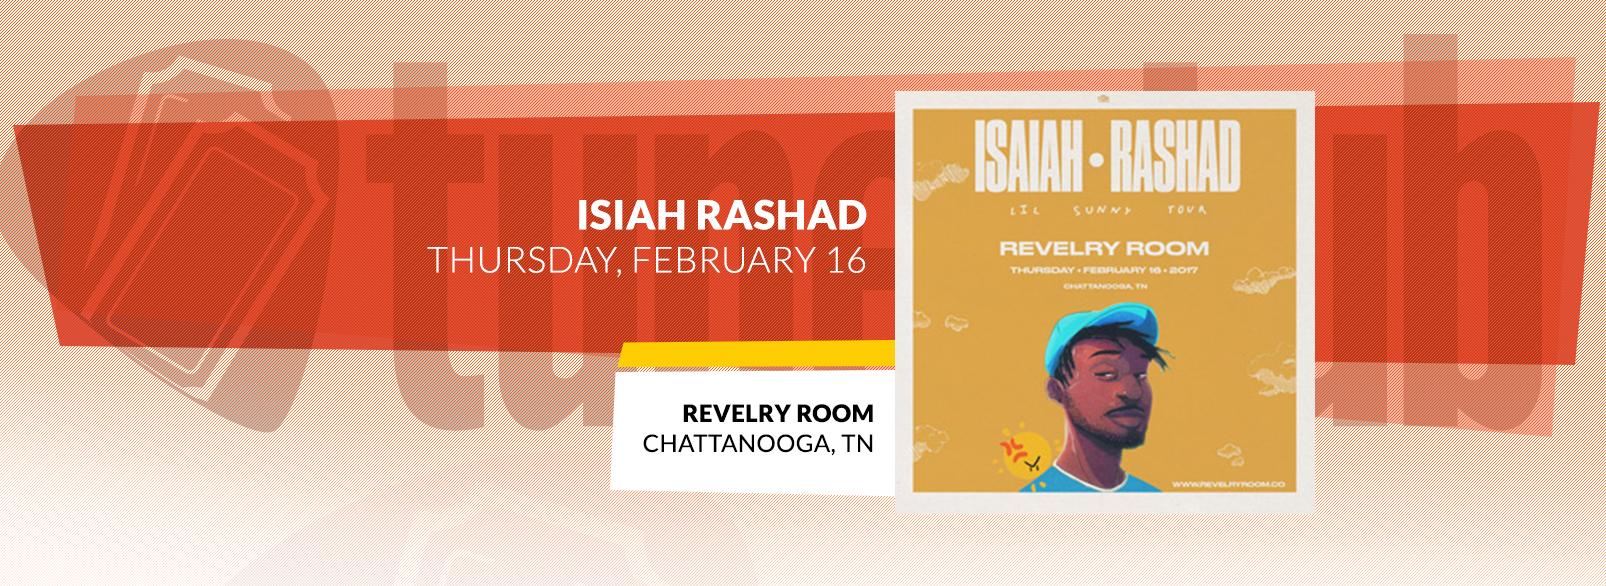 Isaiah Rashad @ Revelry Room